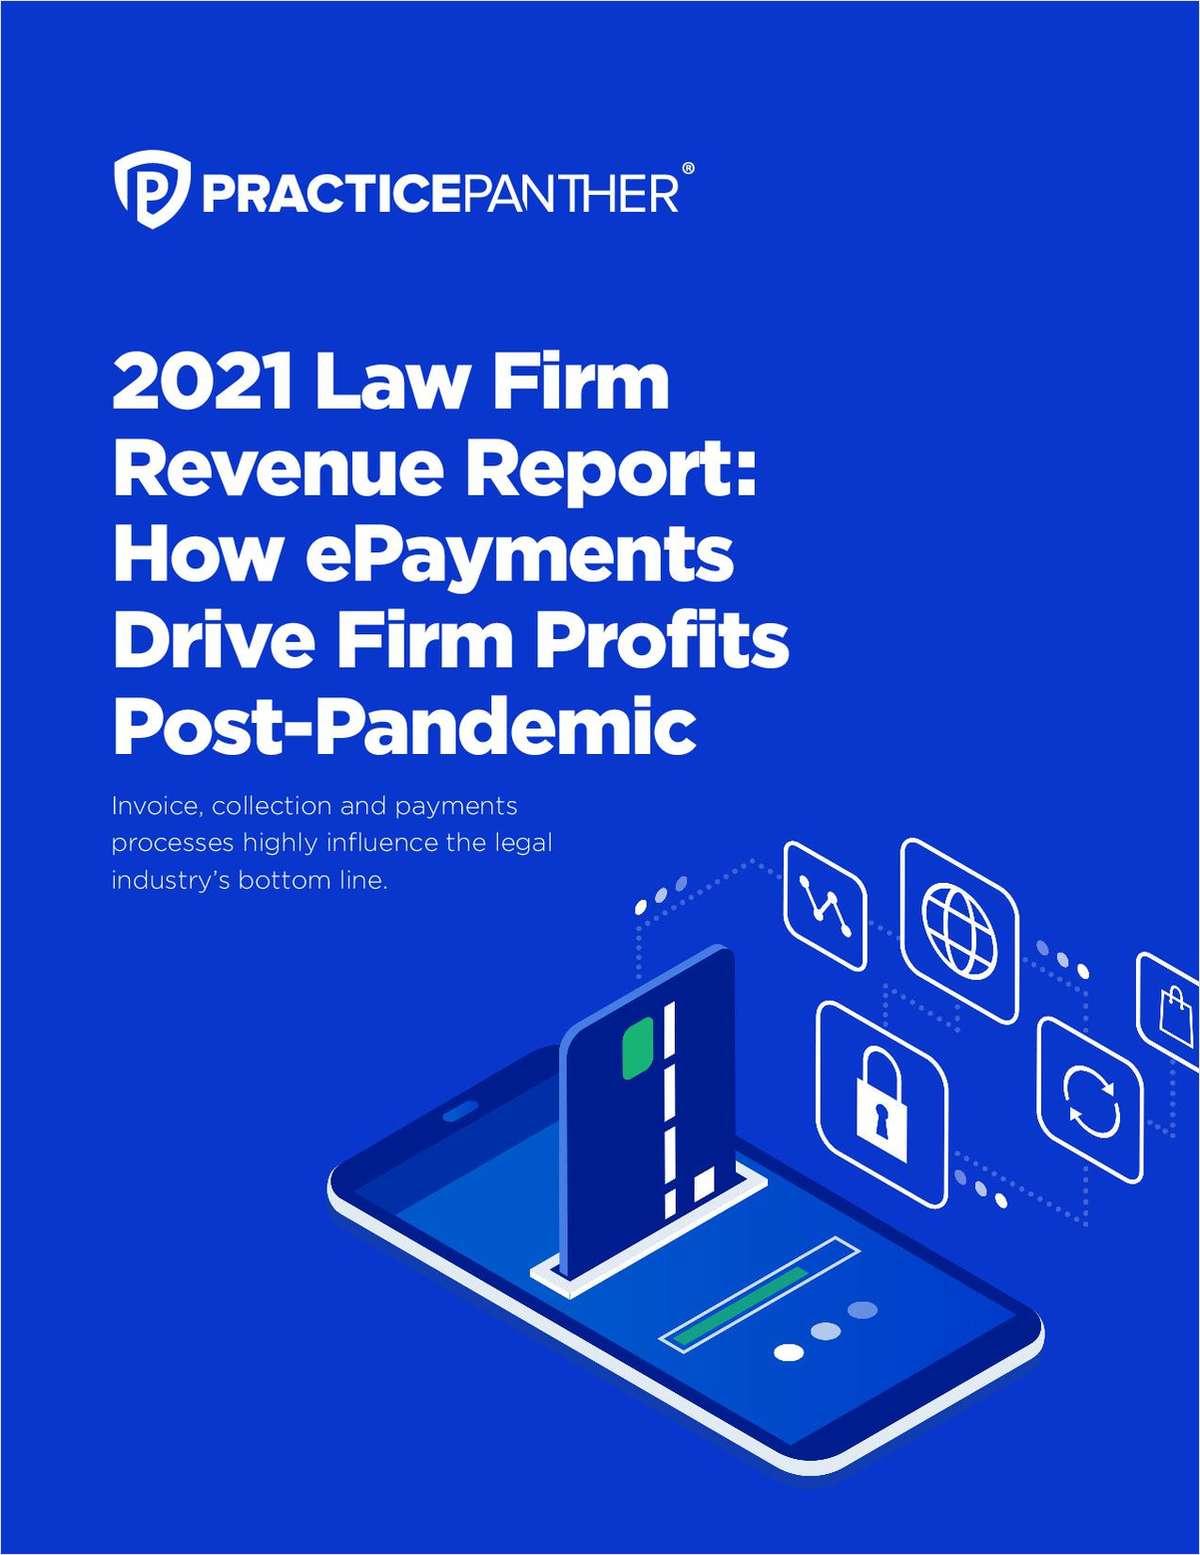 2021 Law Firm Revenue Report: How ePayments Drive Firm Profits Post-Pandemic